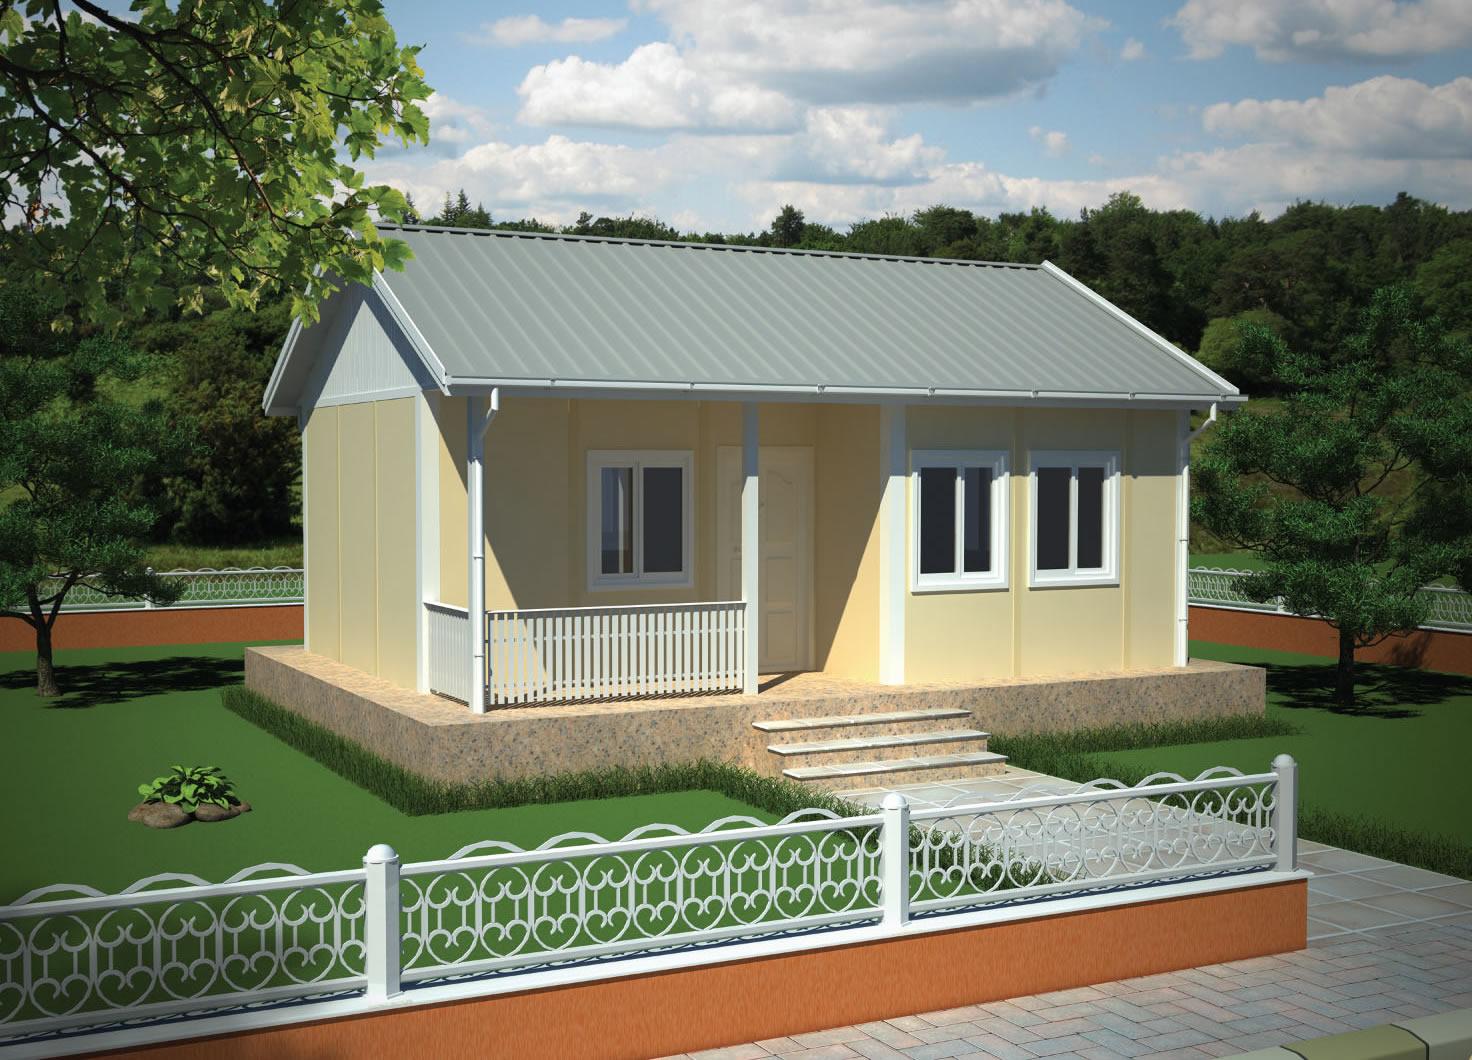 37 m2 Tek Katlı Ev